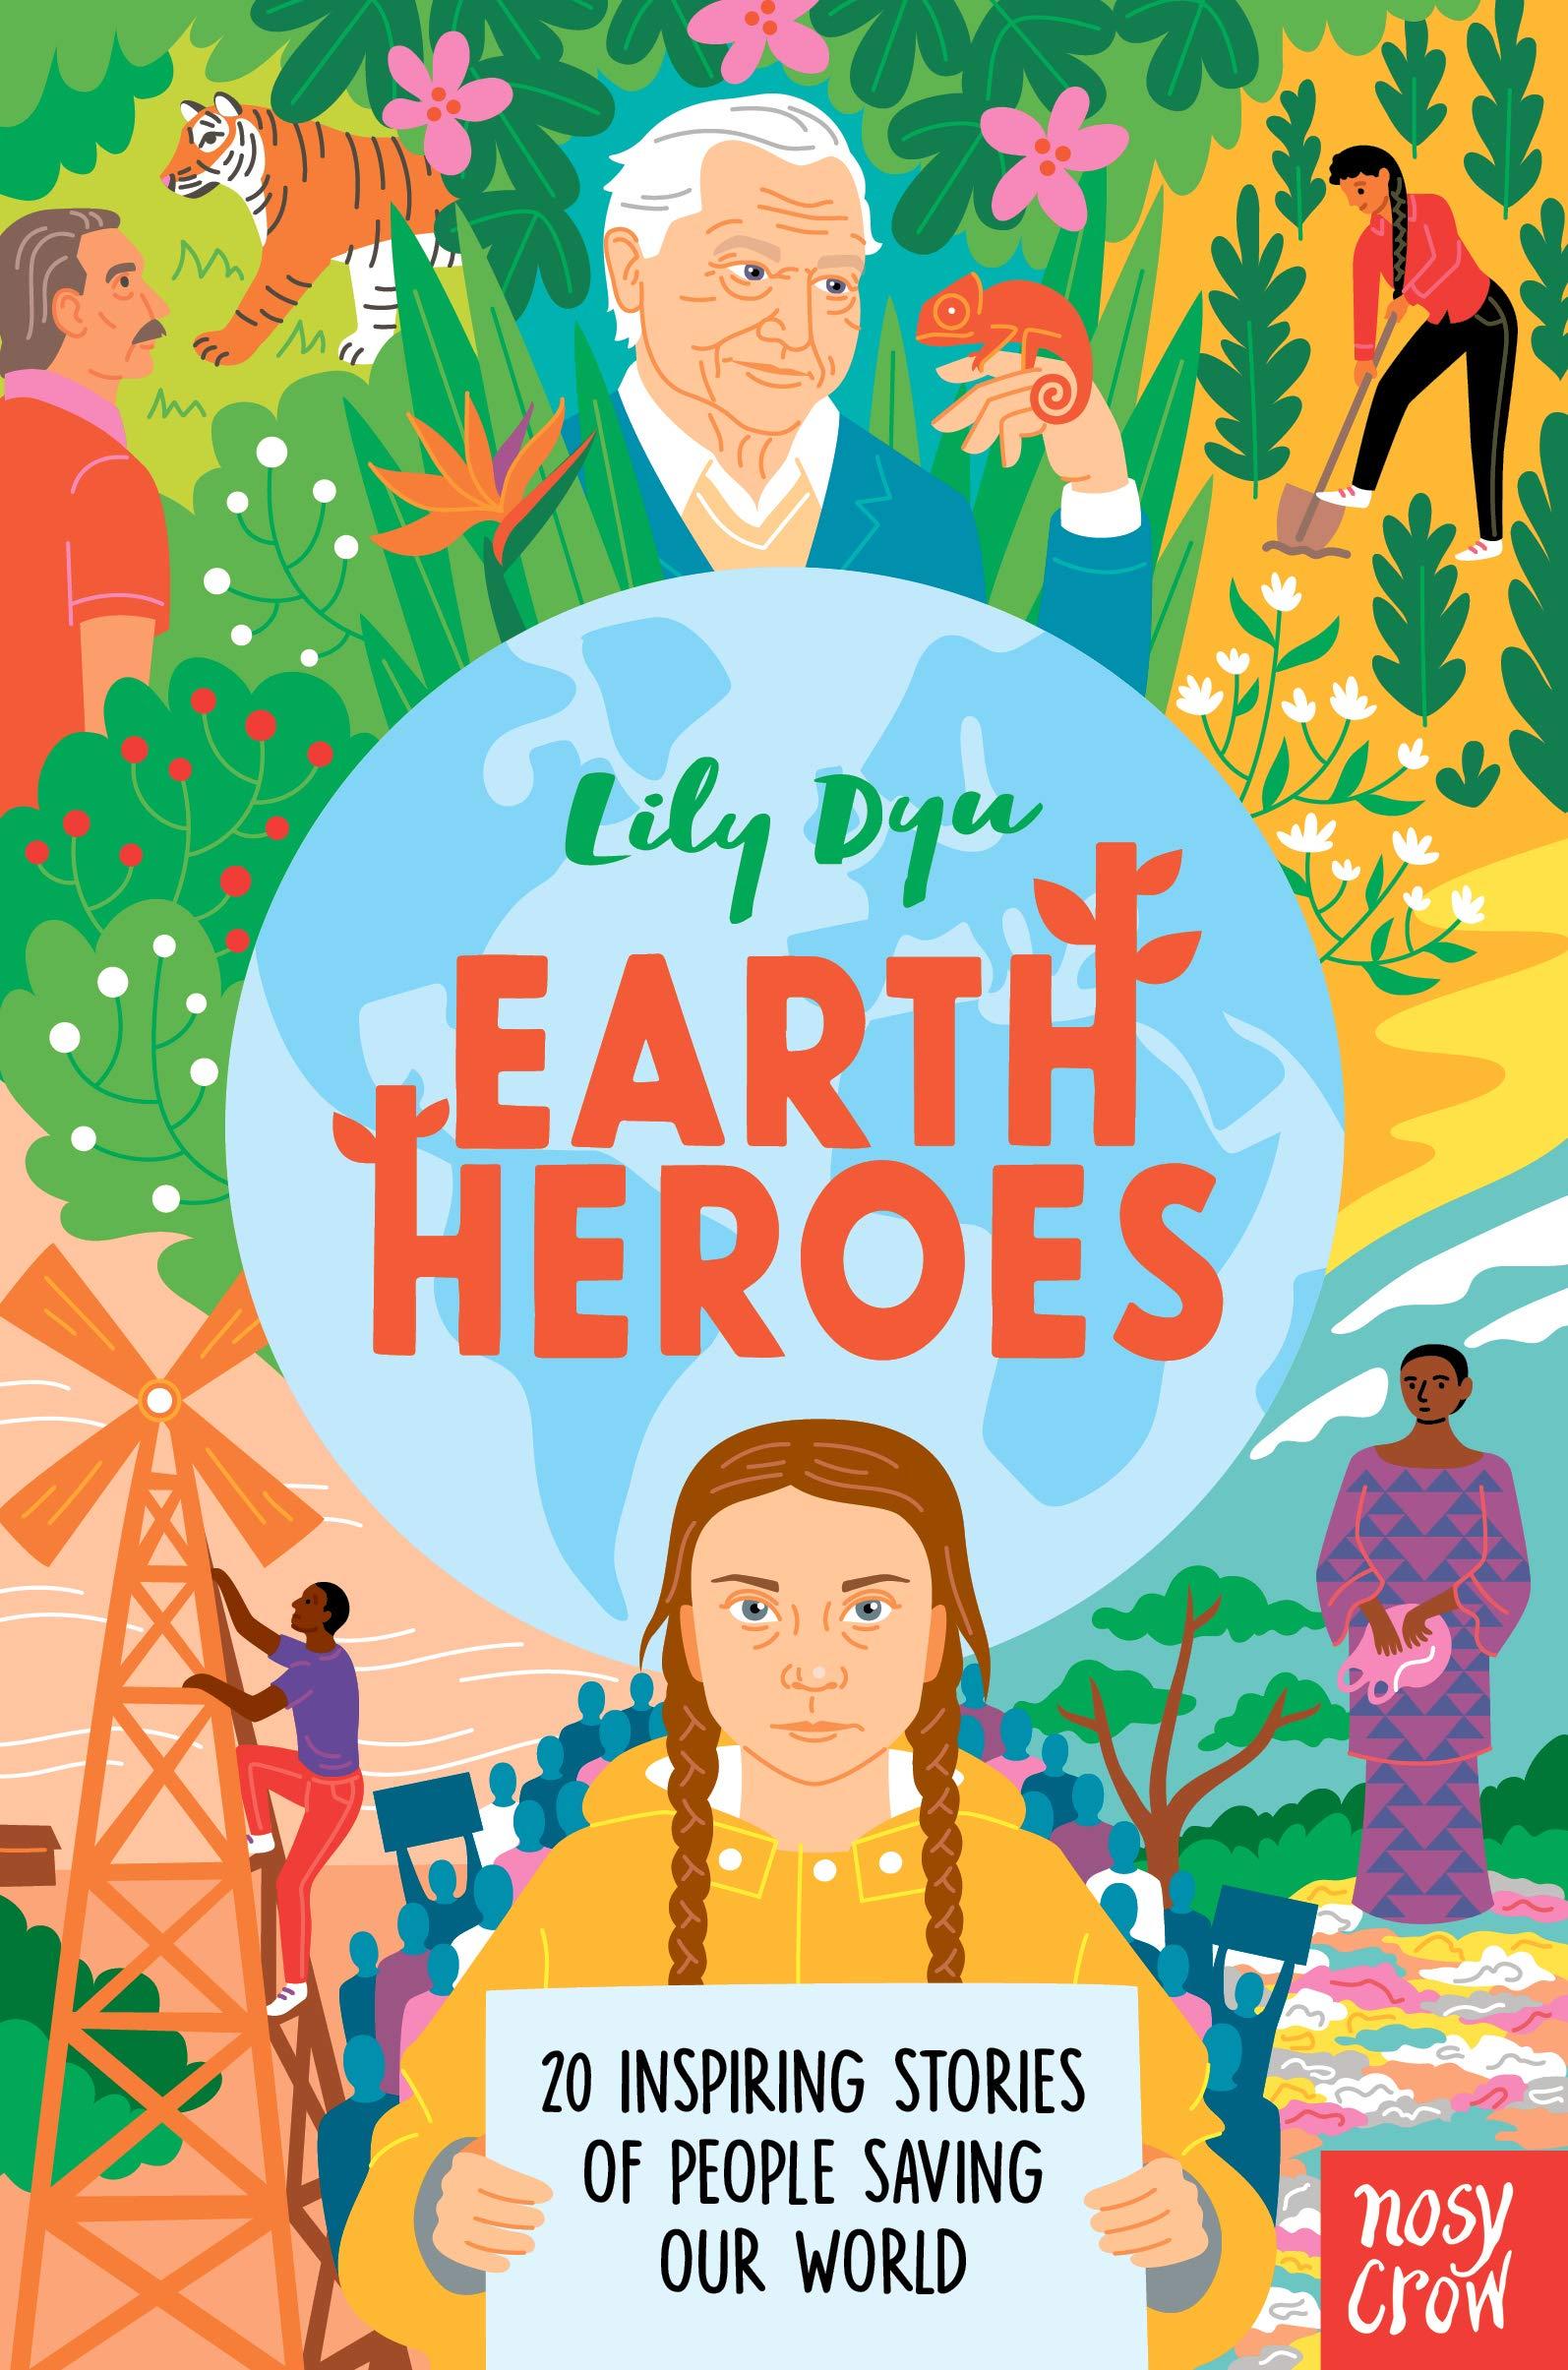 Earth Heroes - Lily Dyu